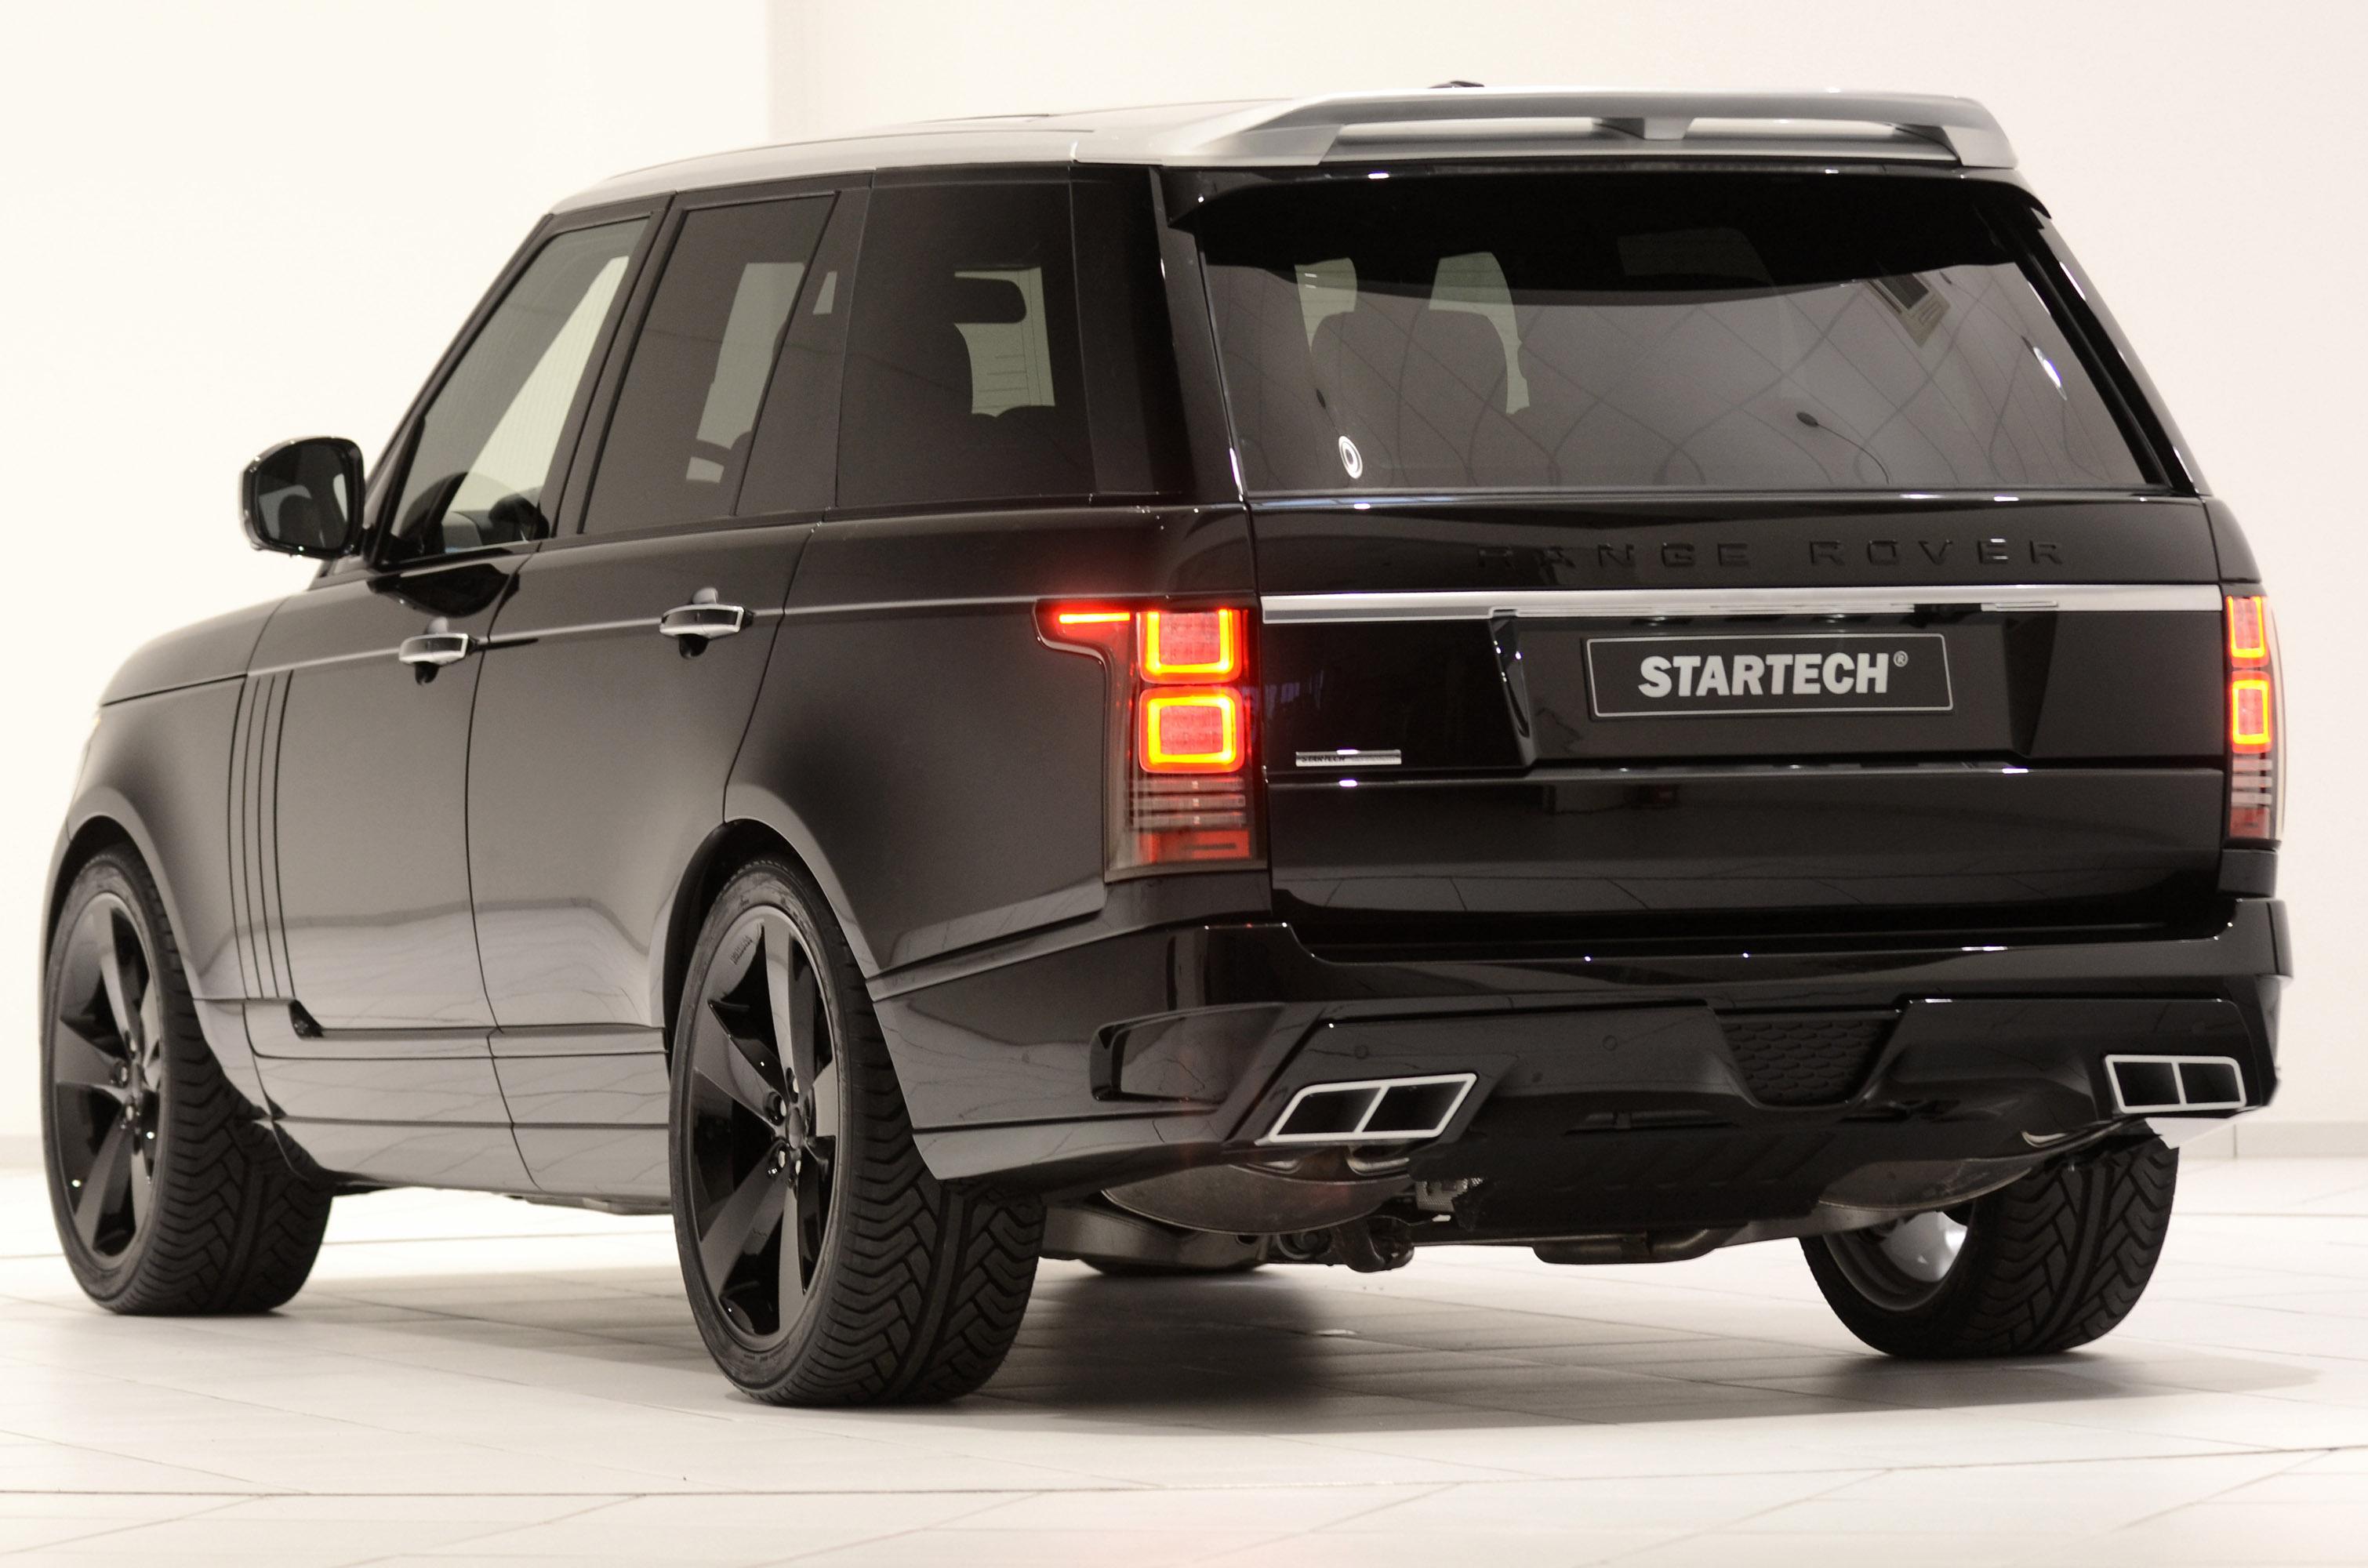 http://www.automobilesreview.com/img/startech-2013-range-rover/startech-2013-range-rover-04.jpg